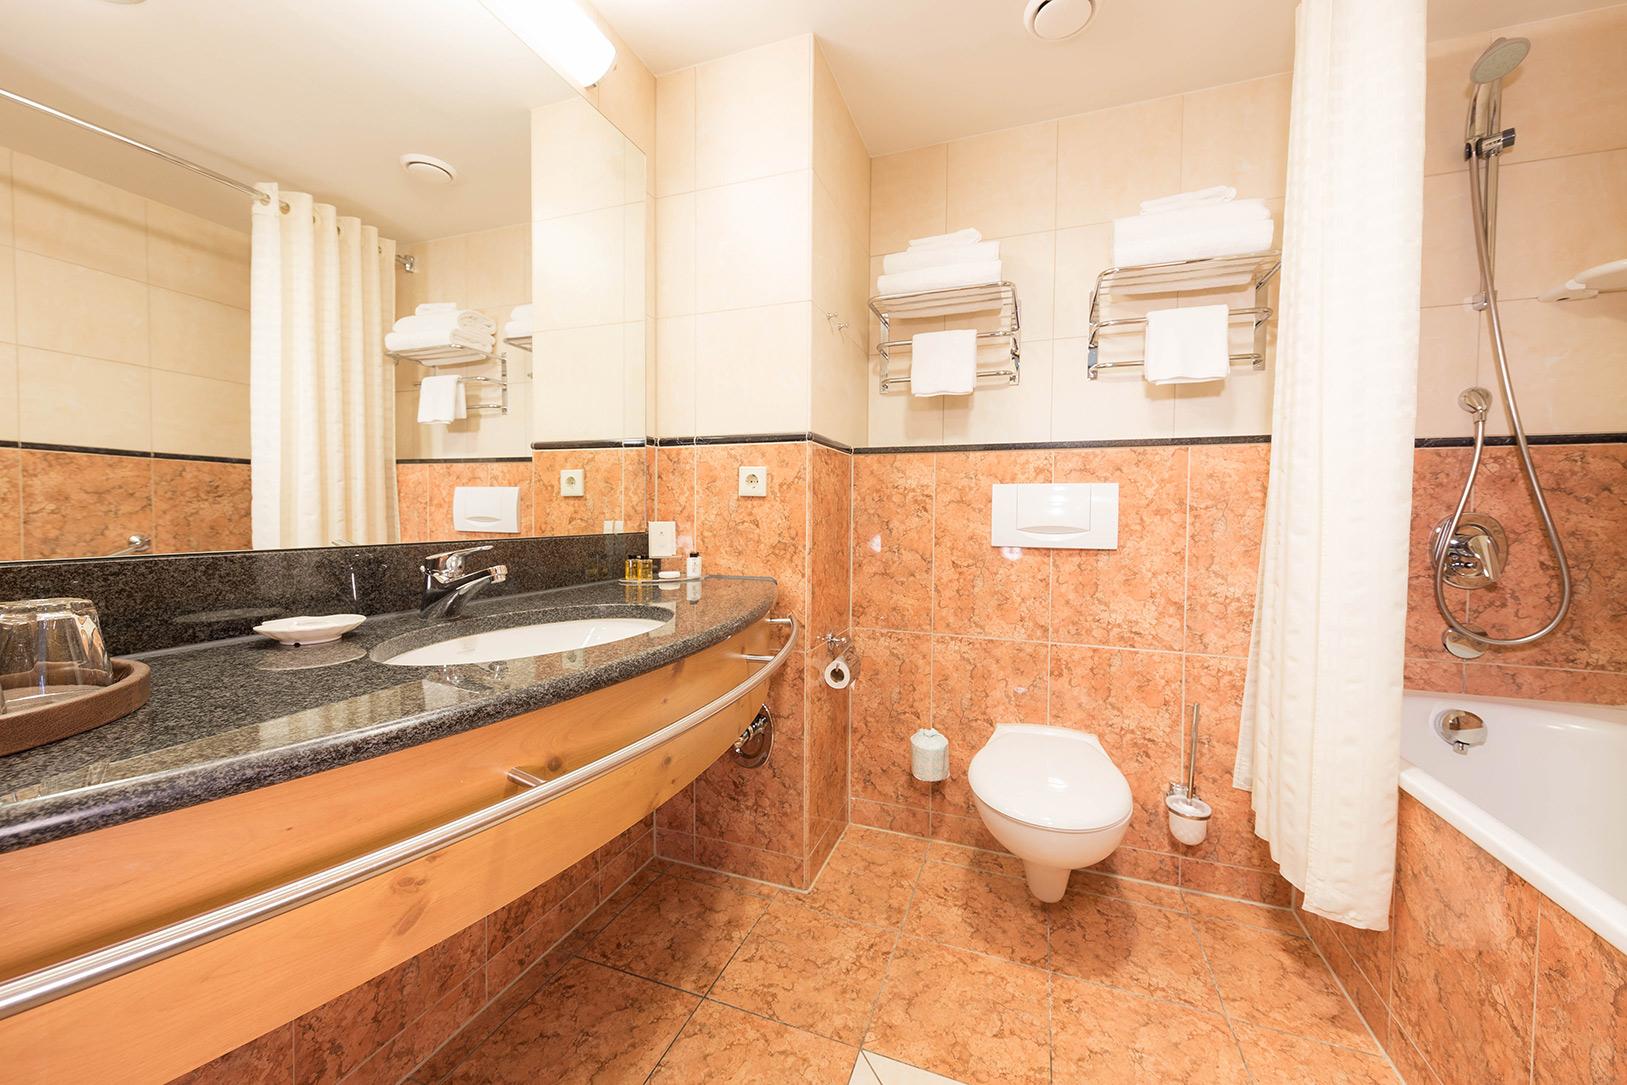 elr_room_bathroom_02_web.jpg